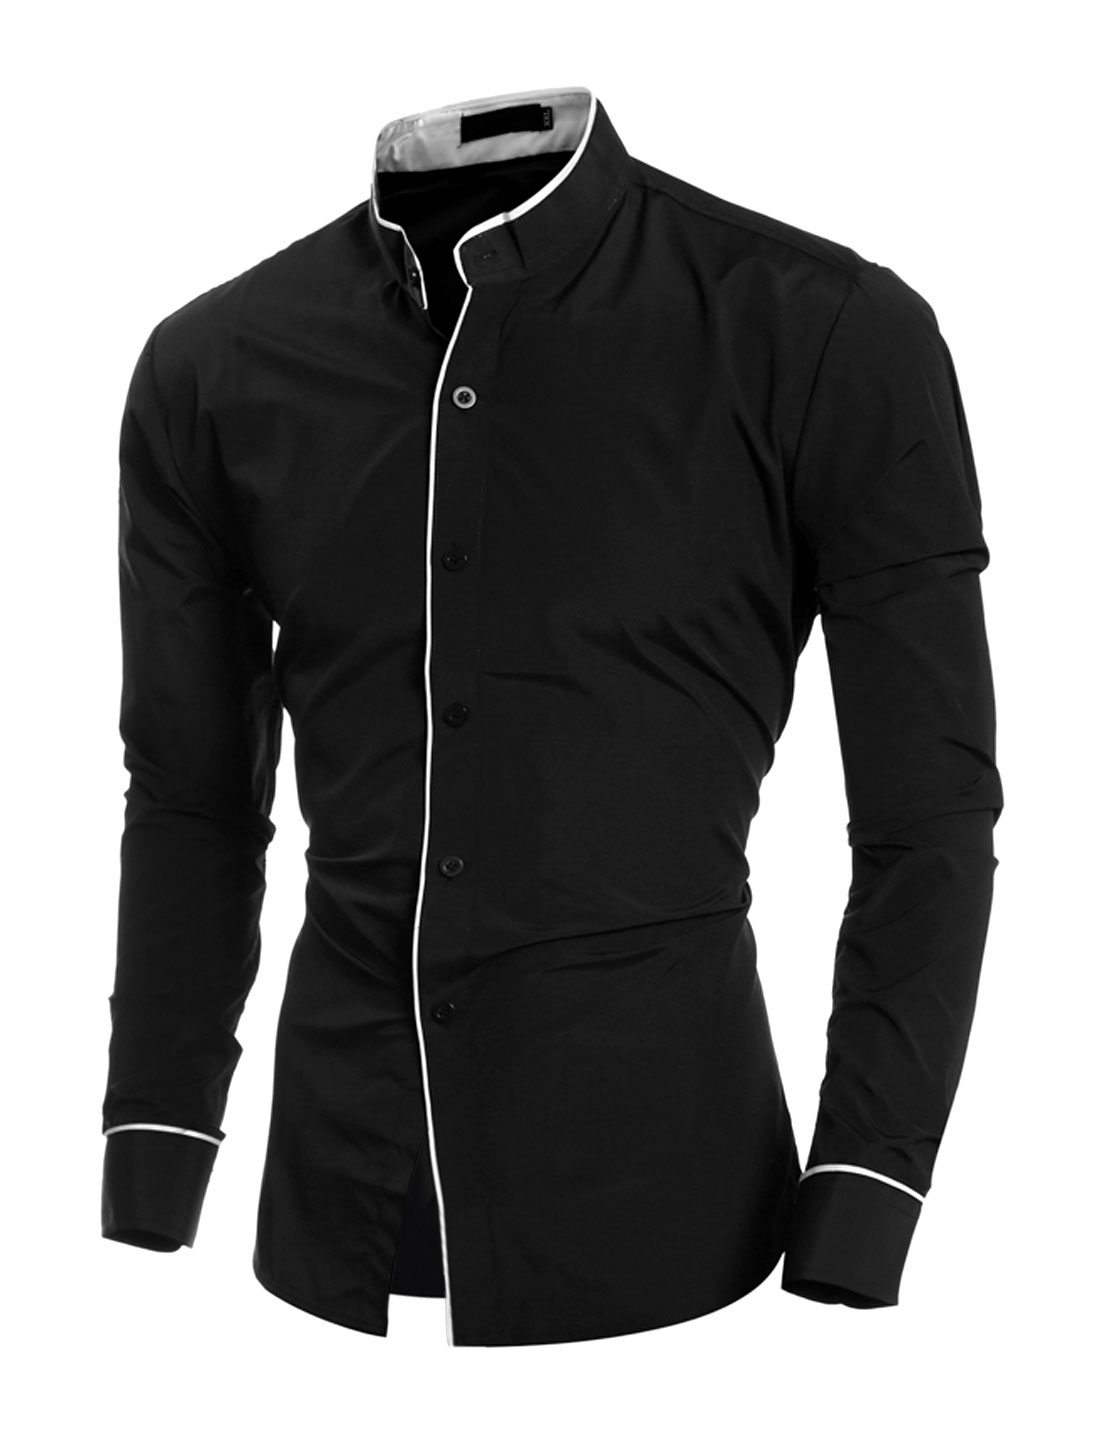 Men Stand Collar Long Sleeves Button Down Slim Fit Shirt Black M